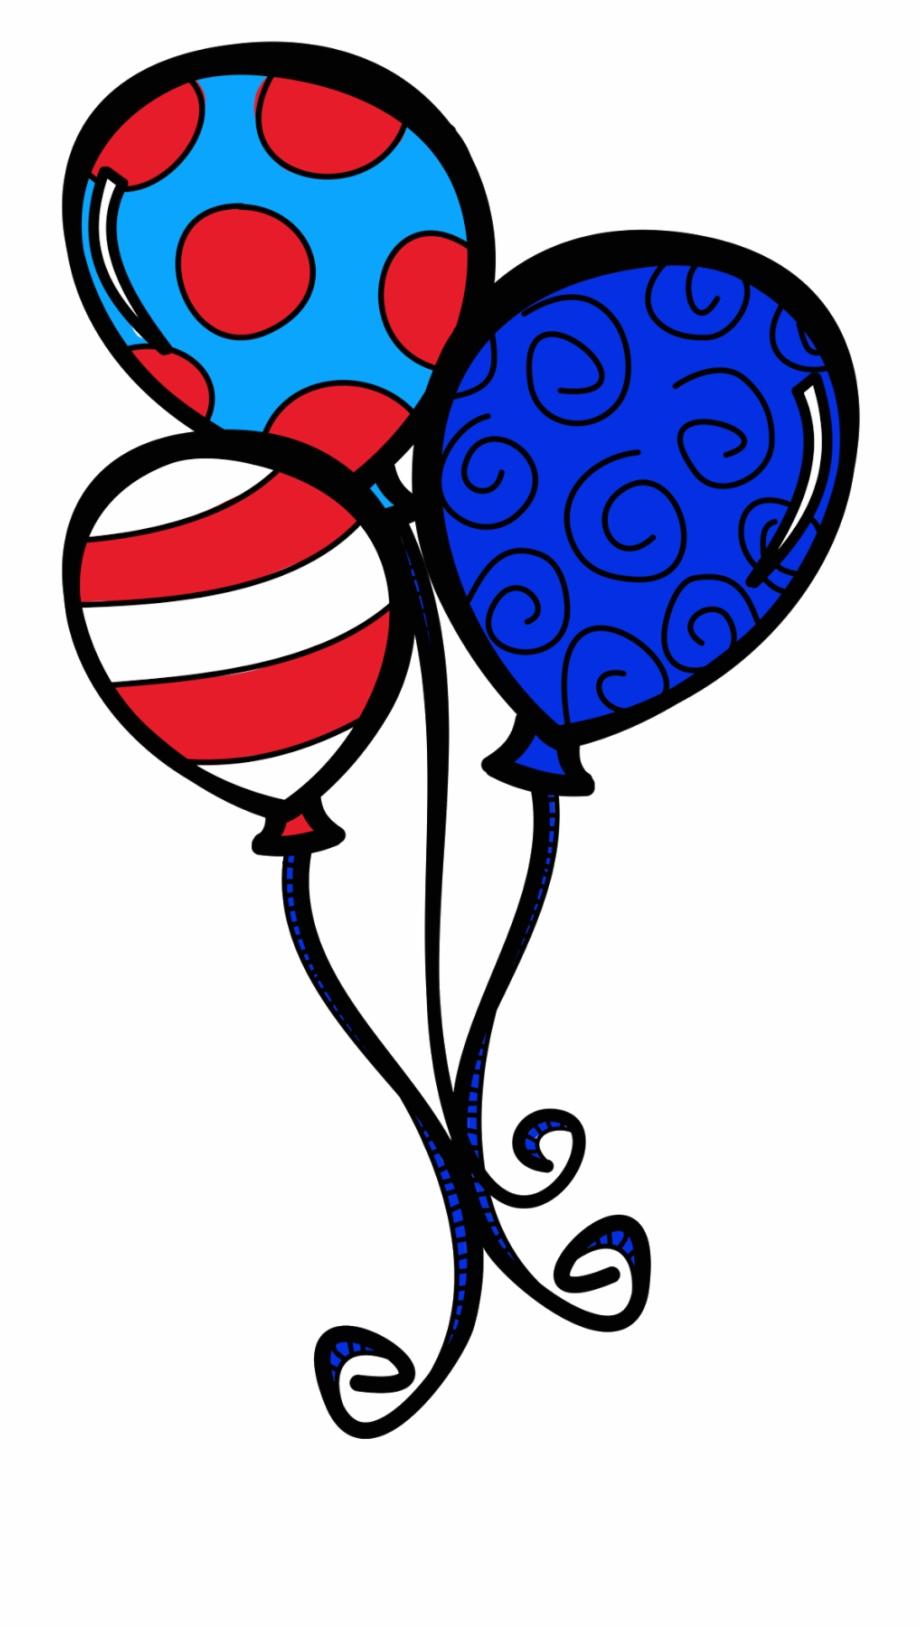 Dr Seuss Balloon Clipart.